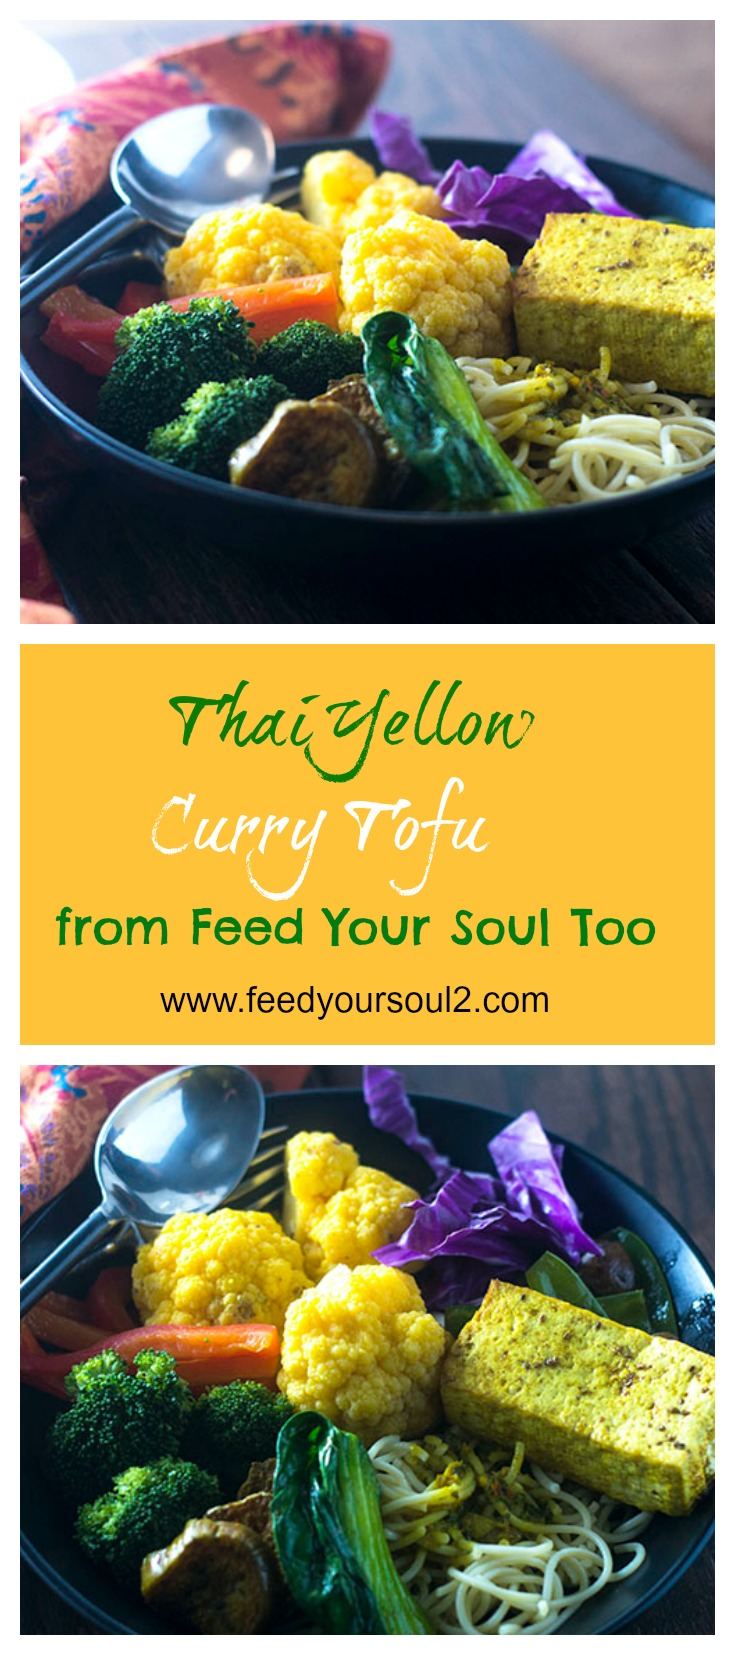 Thai Yellow Curry Tofu #vegan #Thaifood #dinner #vegetarian | feedyoursoul2.com